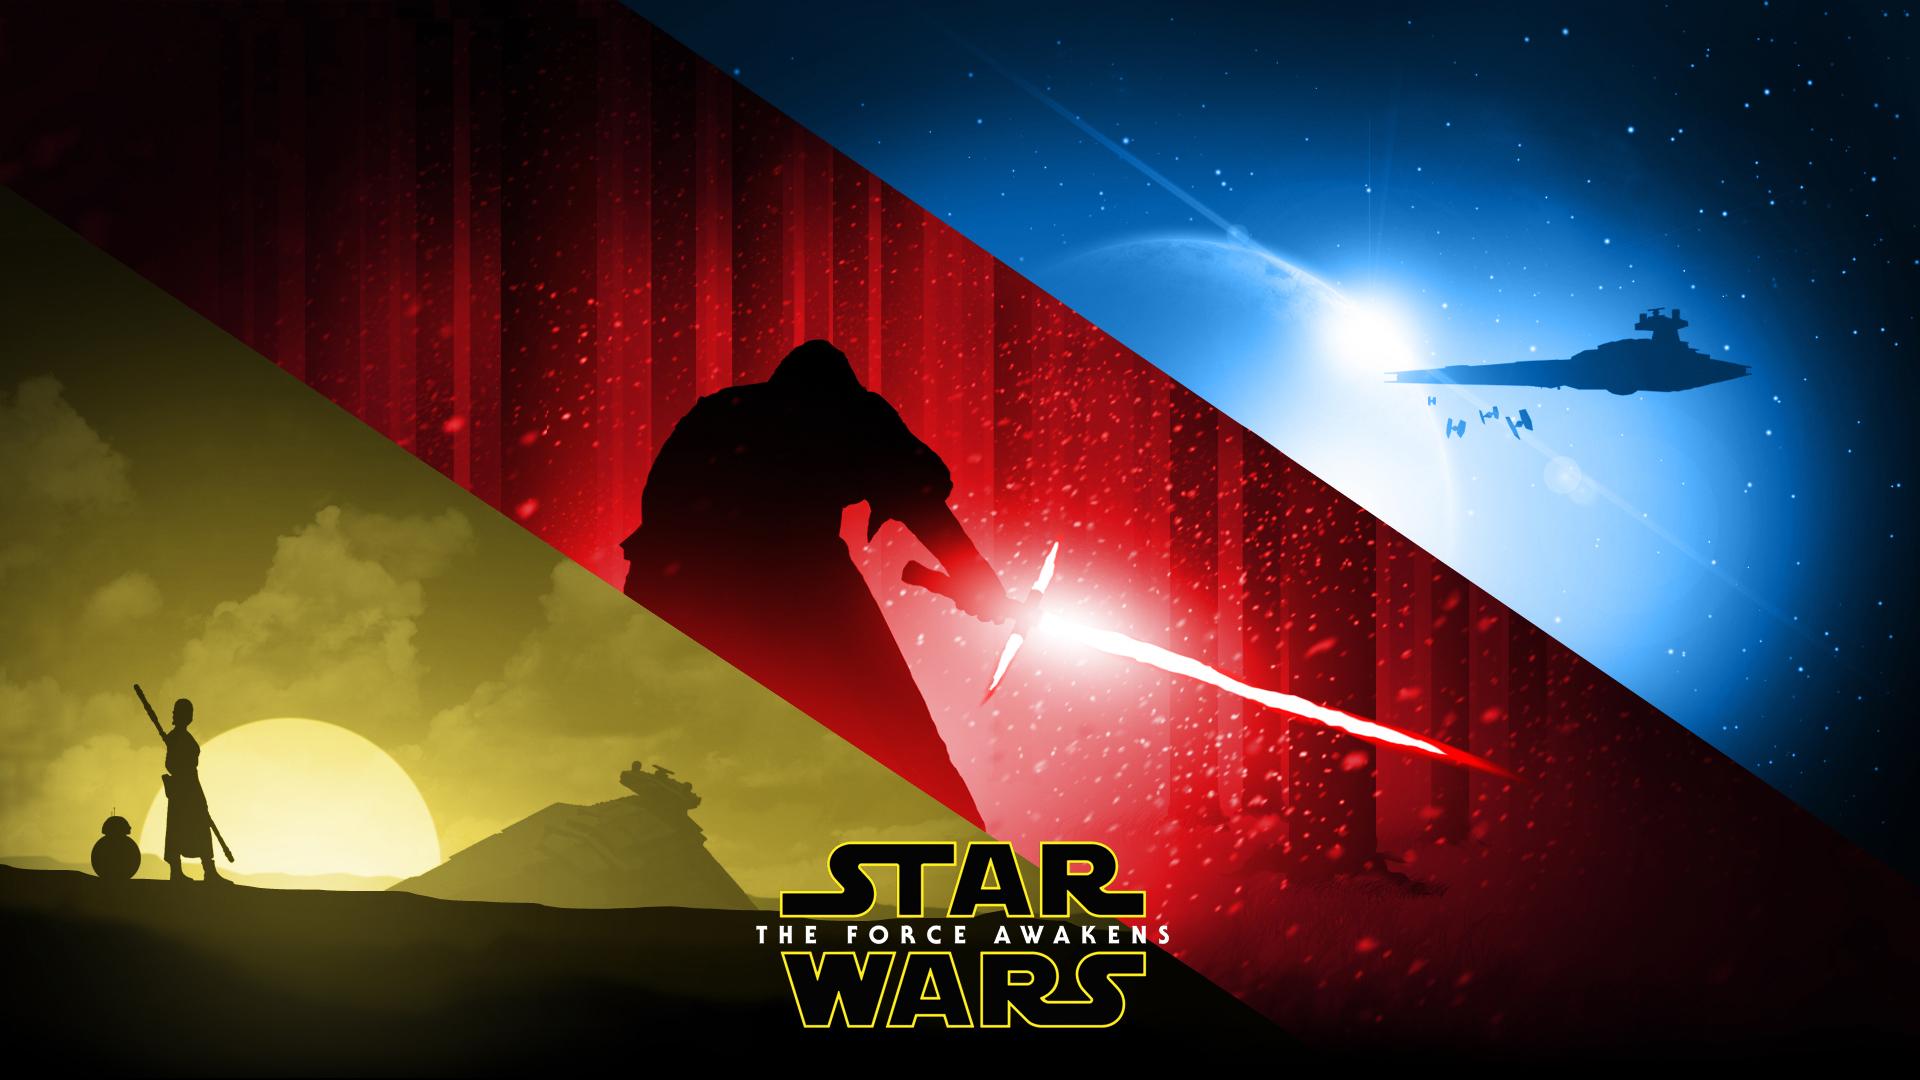 Star Wars The Force Awakens Wallpaper by RockLou on DeviantArt